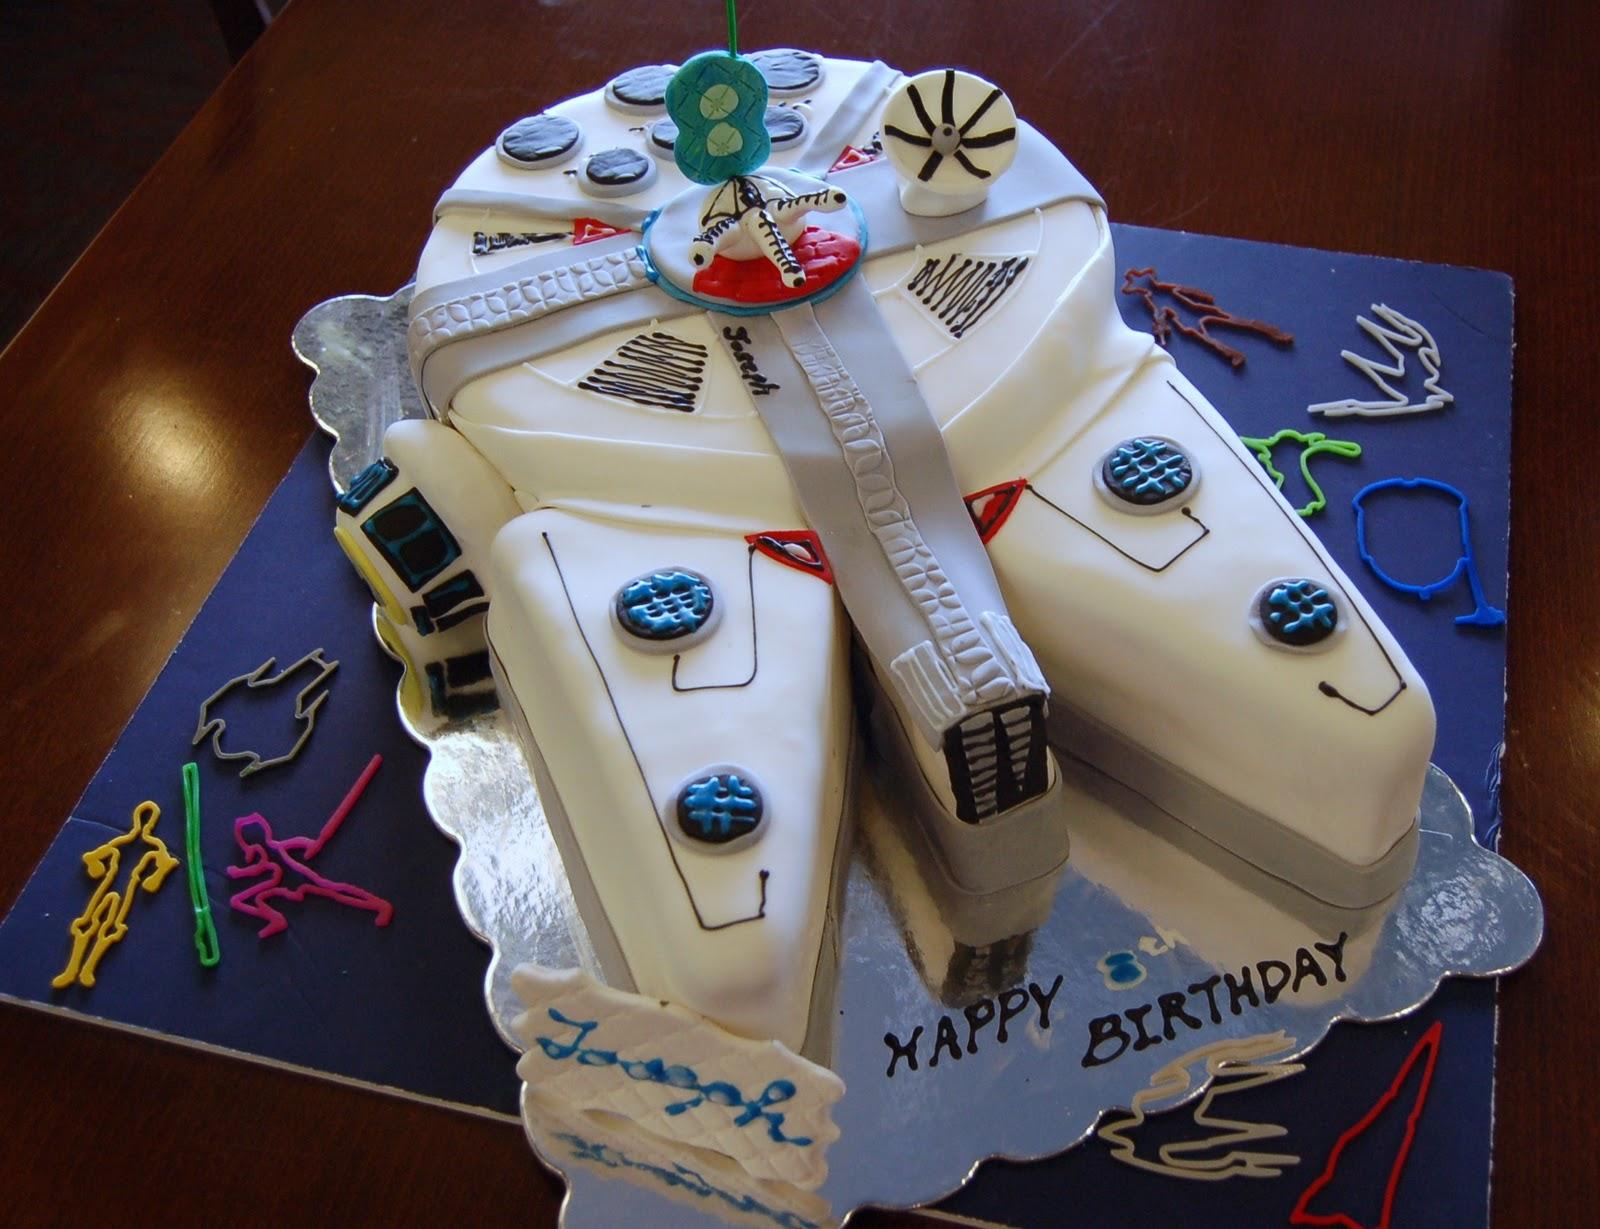 Birthday Cake For Joseph ~ Haven sweets star wars spaceship cake for joseph s th birthday